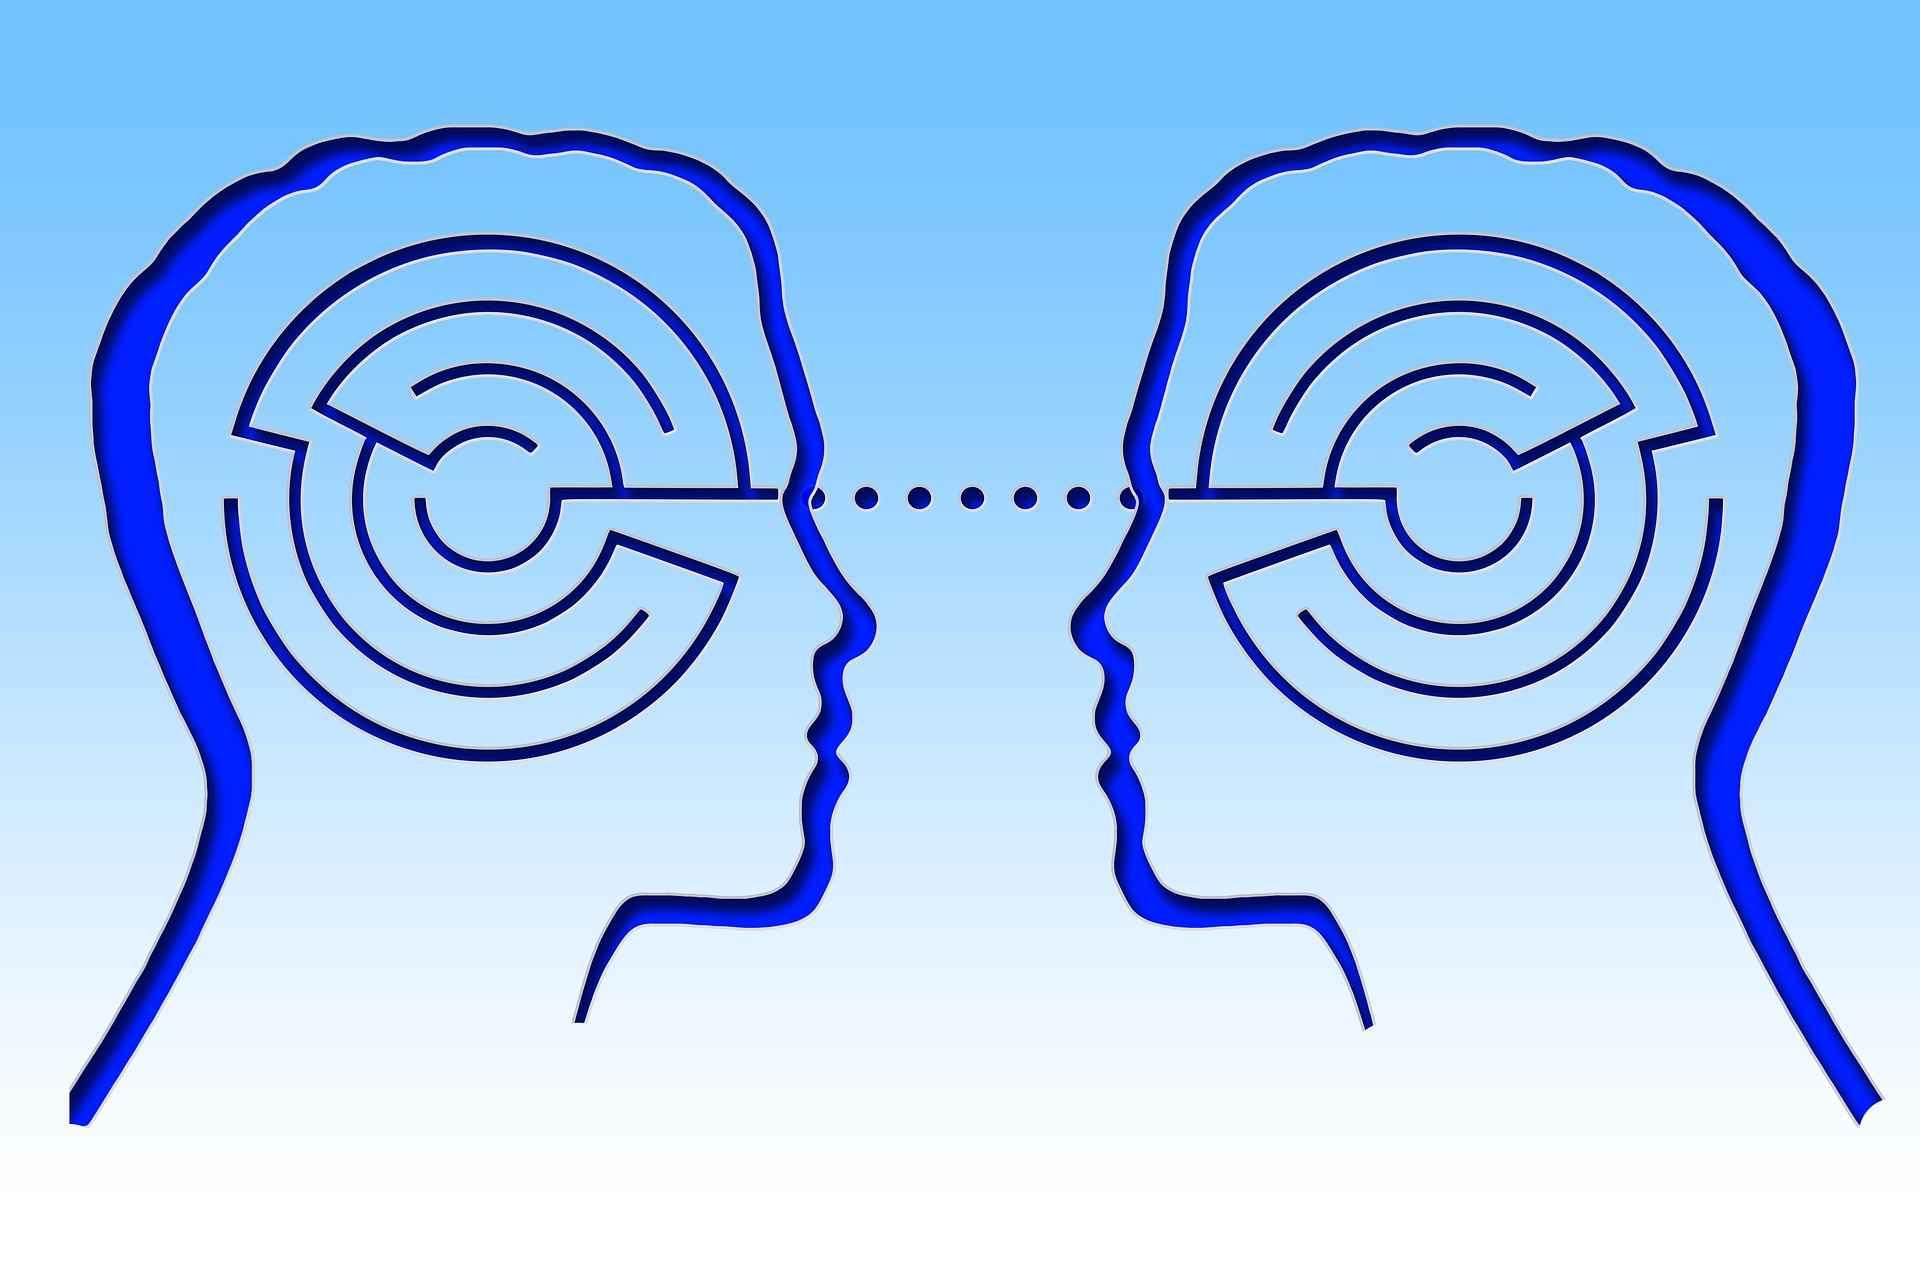 два профила на глави и лабиринти вътре в тах социопатите психопатите 5 разлики